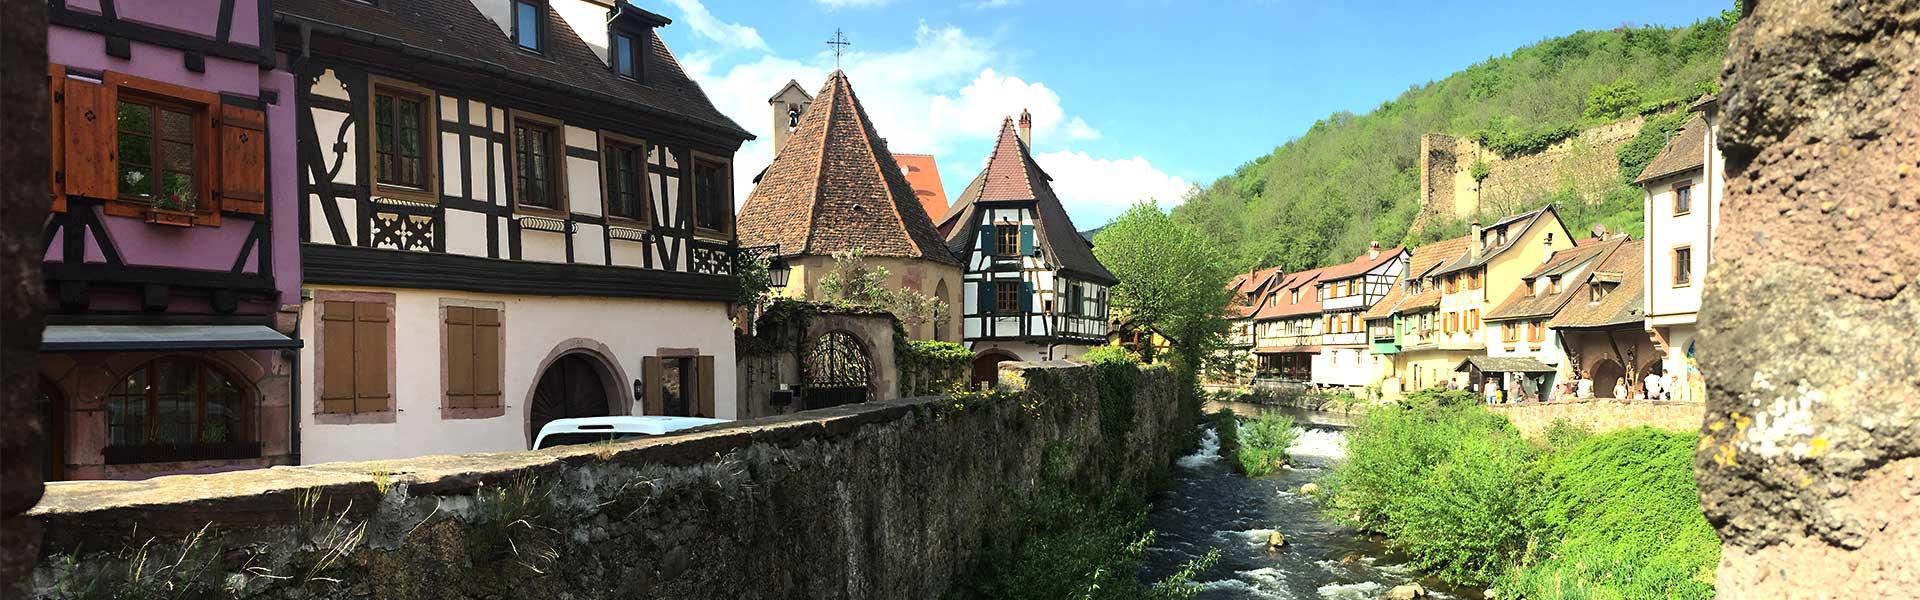 Elsass  Urlaub in Frankreich